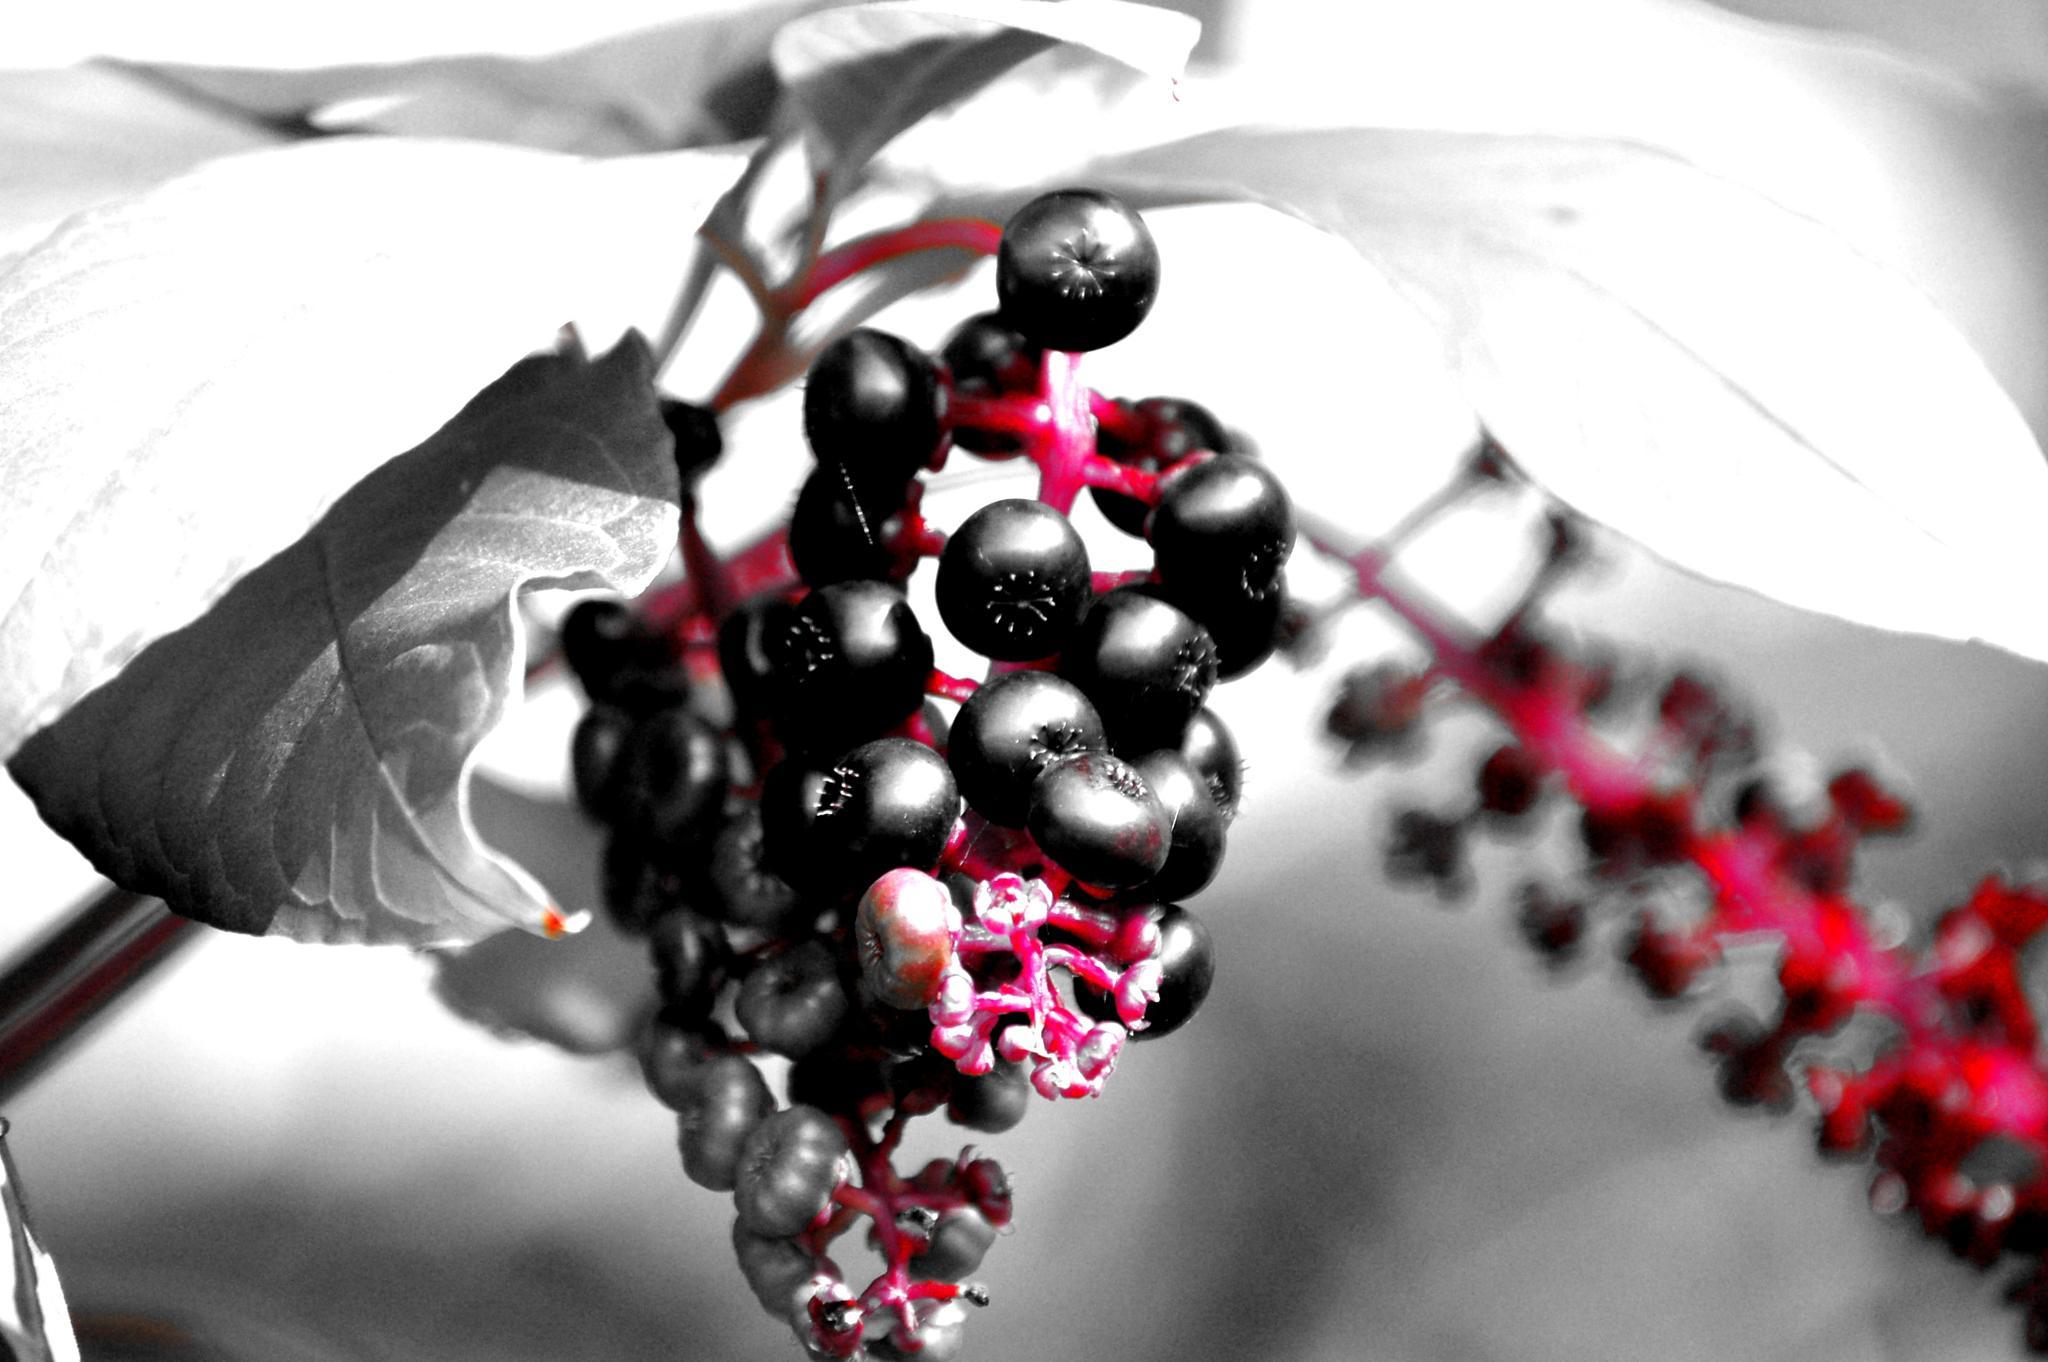 wild berries by pgavin5000